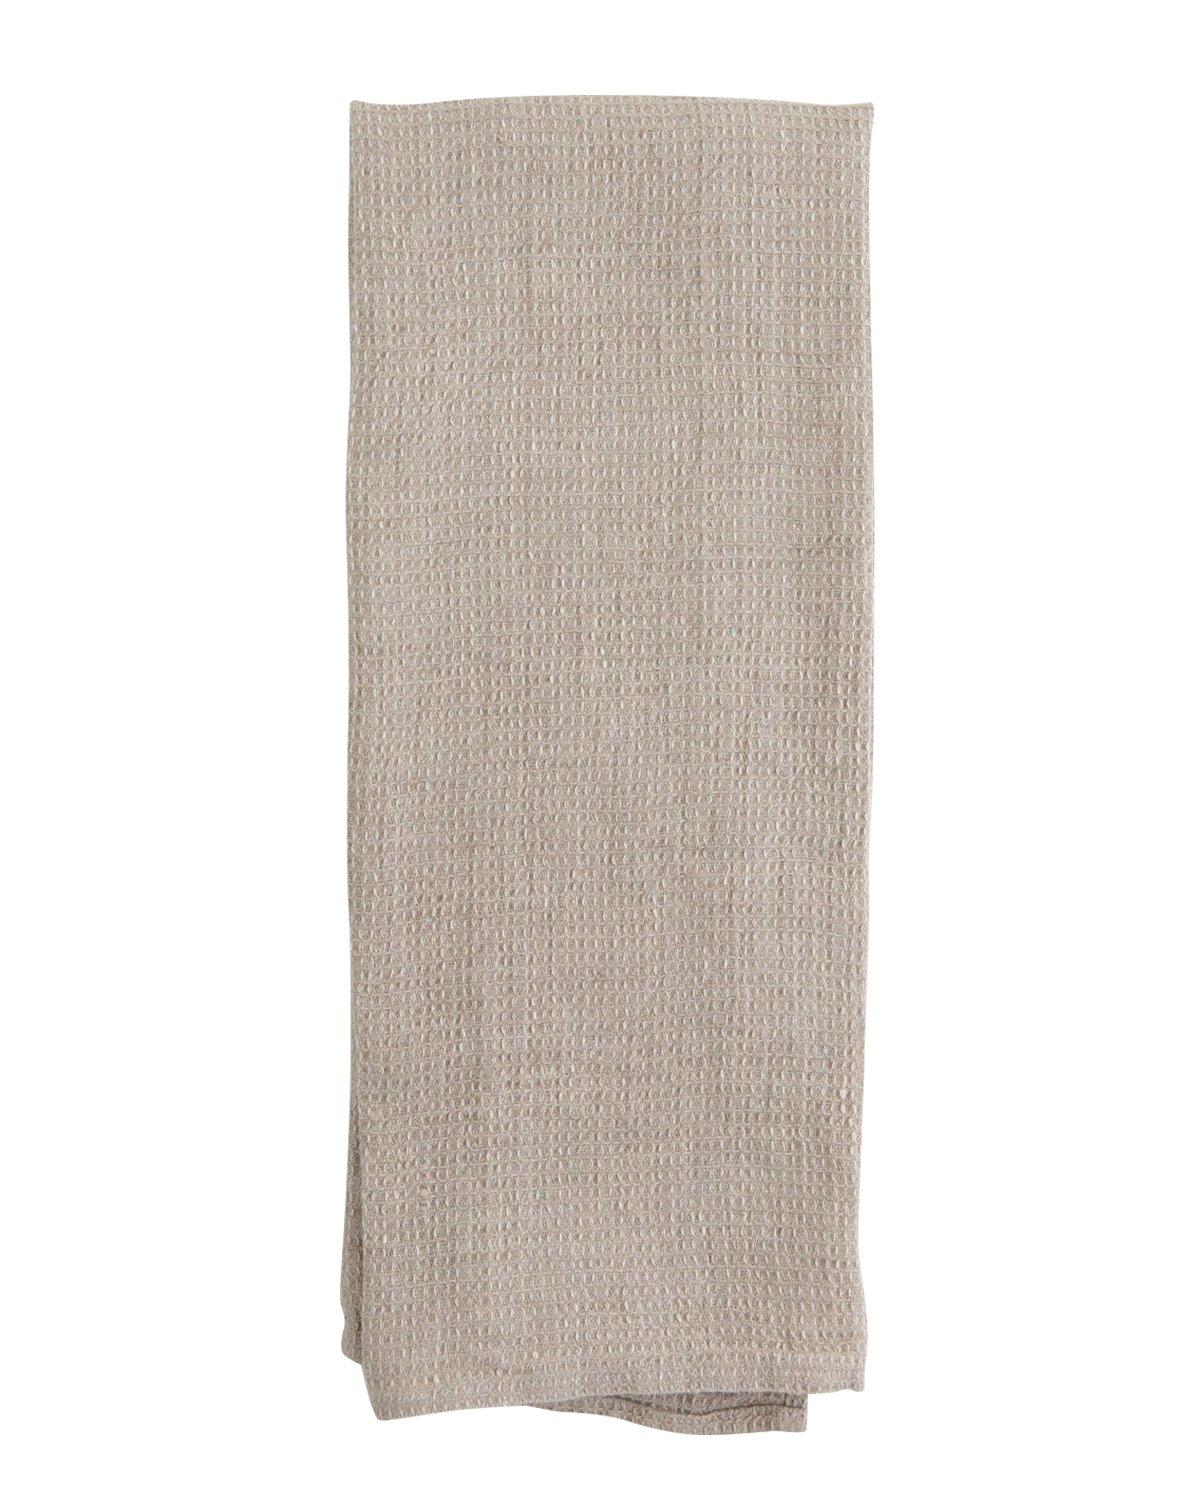 textured_linen_hand_towel6.jpg